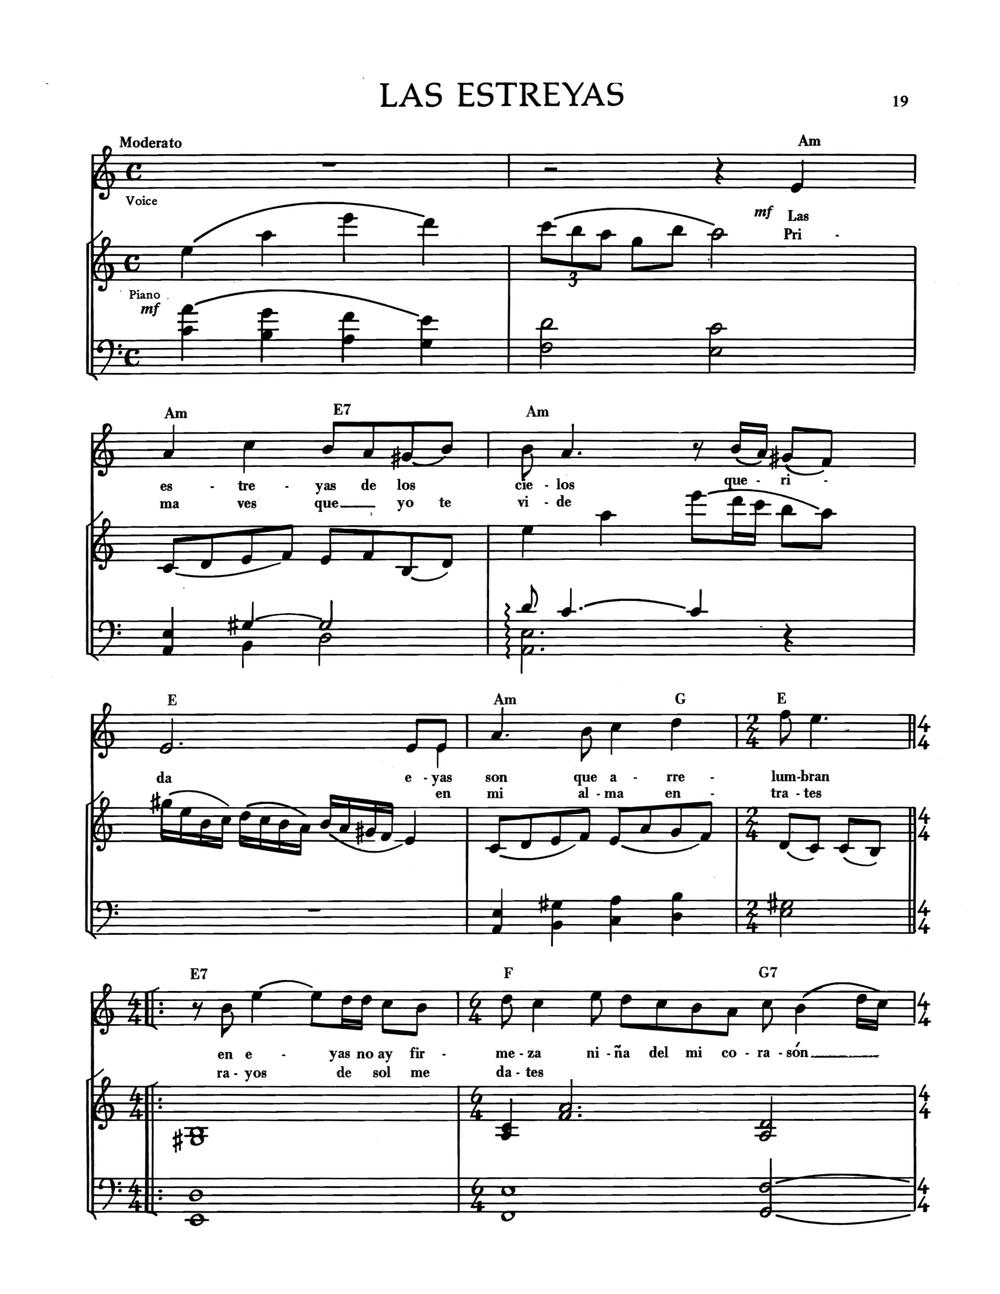 Ladino_Sephardic Music_Page_08.png